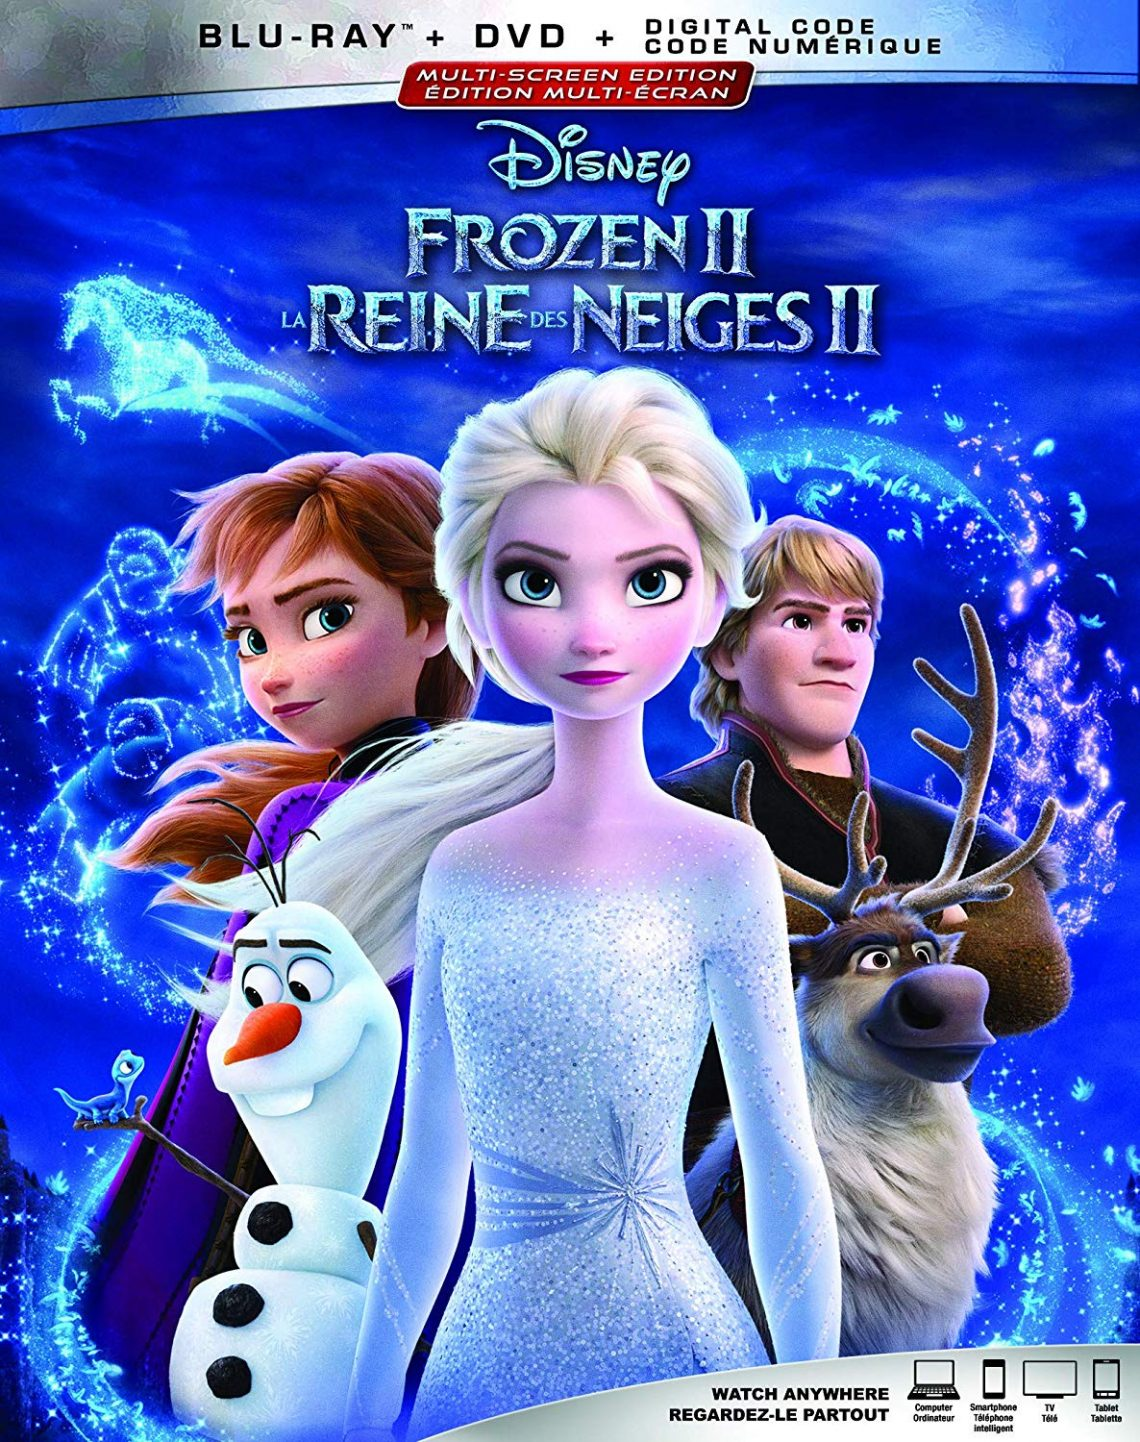 Christophe Reine Des Neiges : christophe, reine, neiges, Frozen, [Blu-ray, Digital], Destination